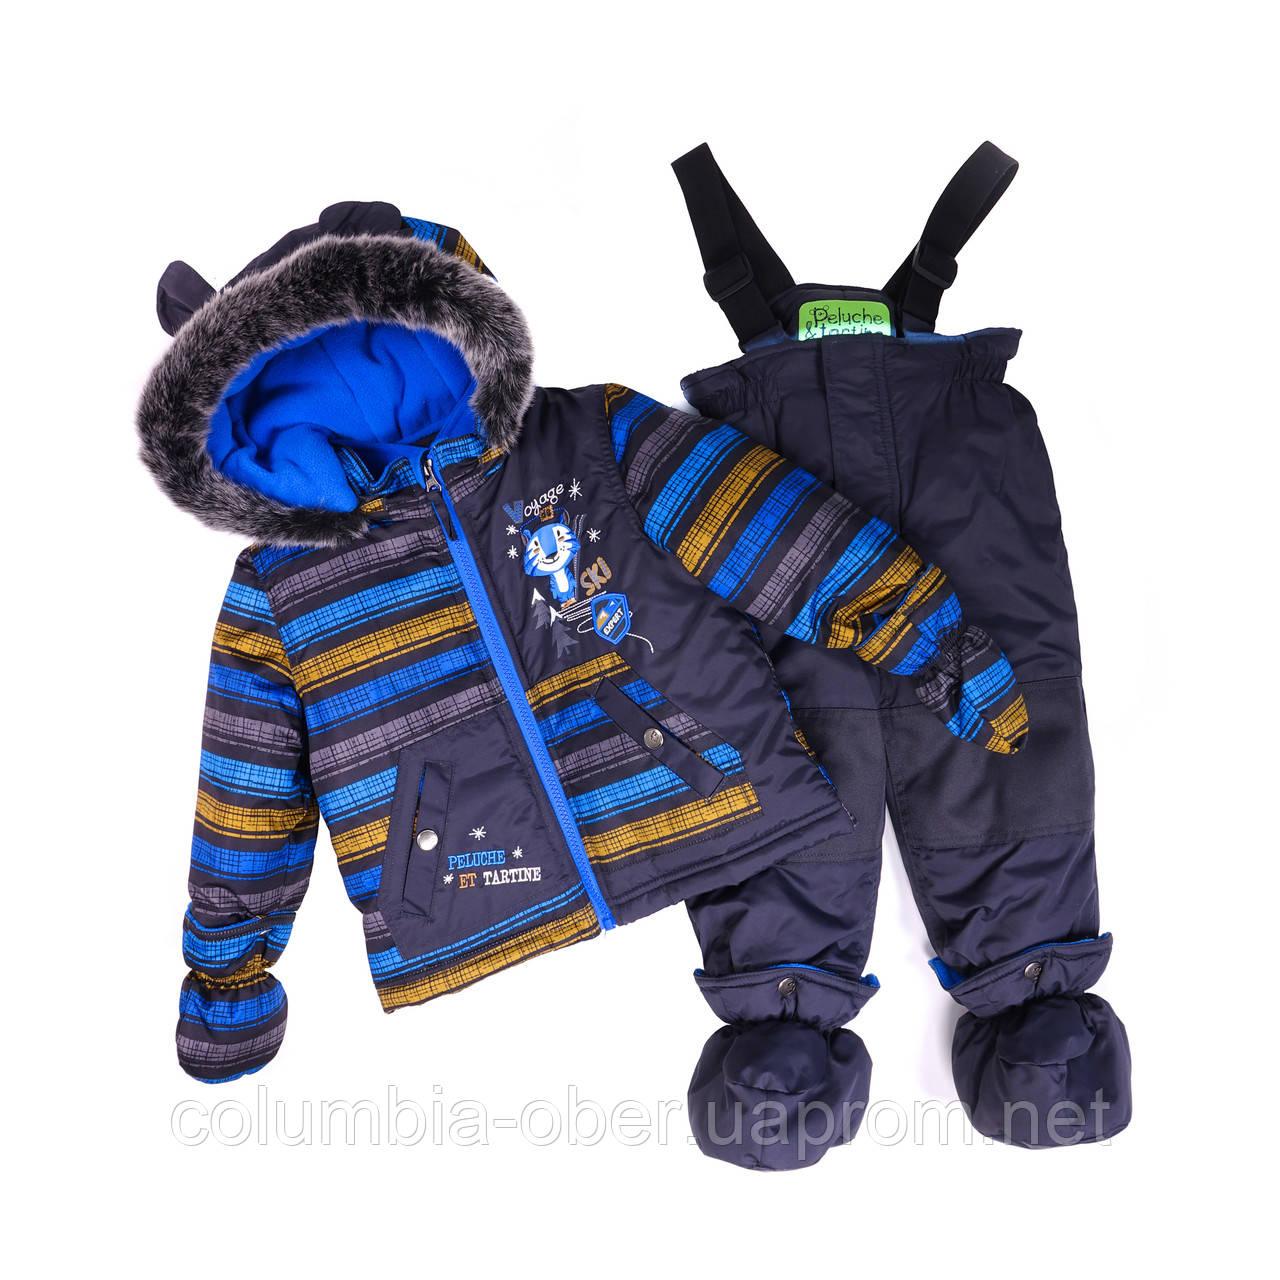 Зимний костюм для мальчика PELUCHE 11 BG M F16 Deep Gray. Размеры 82 -97.